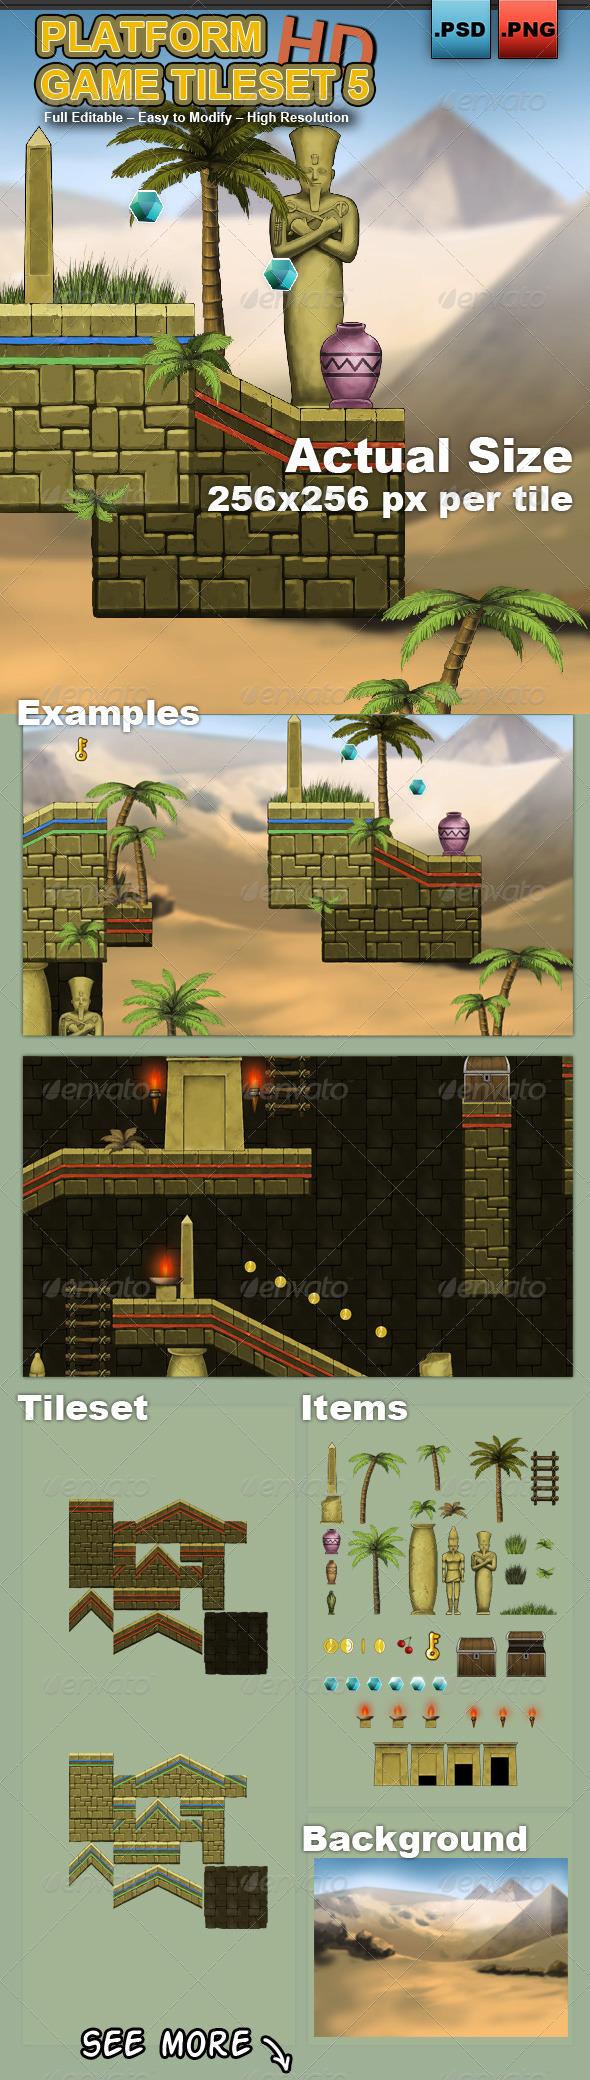 GraphicRiver Platform Game Tileset 5 HD 6961711